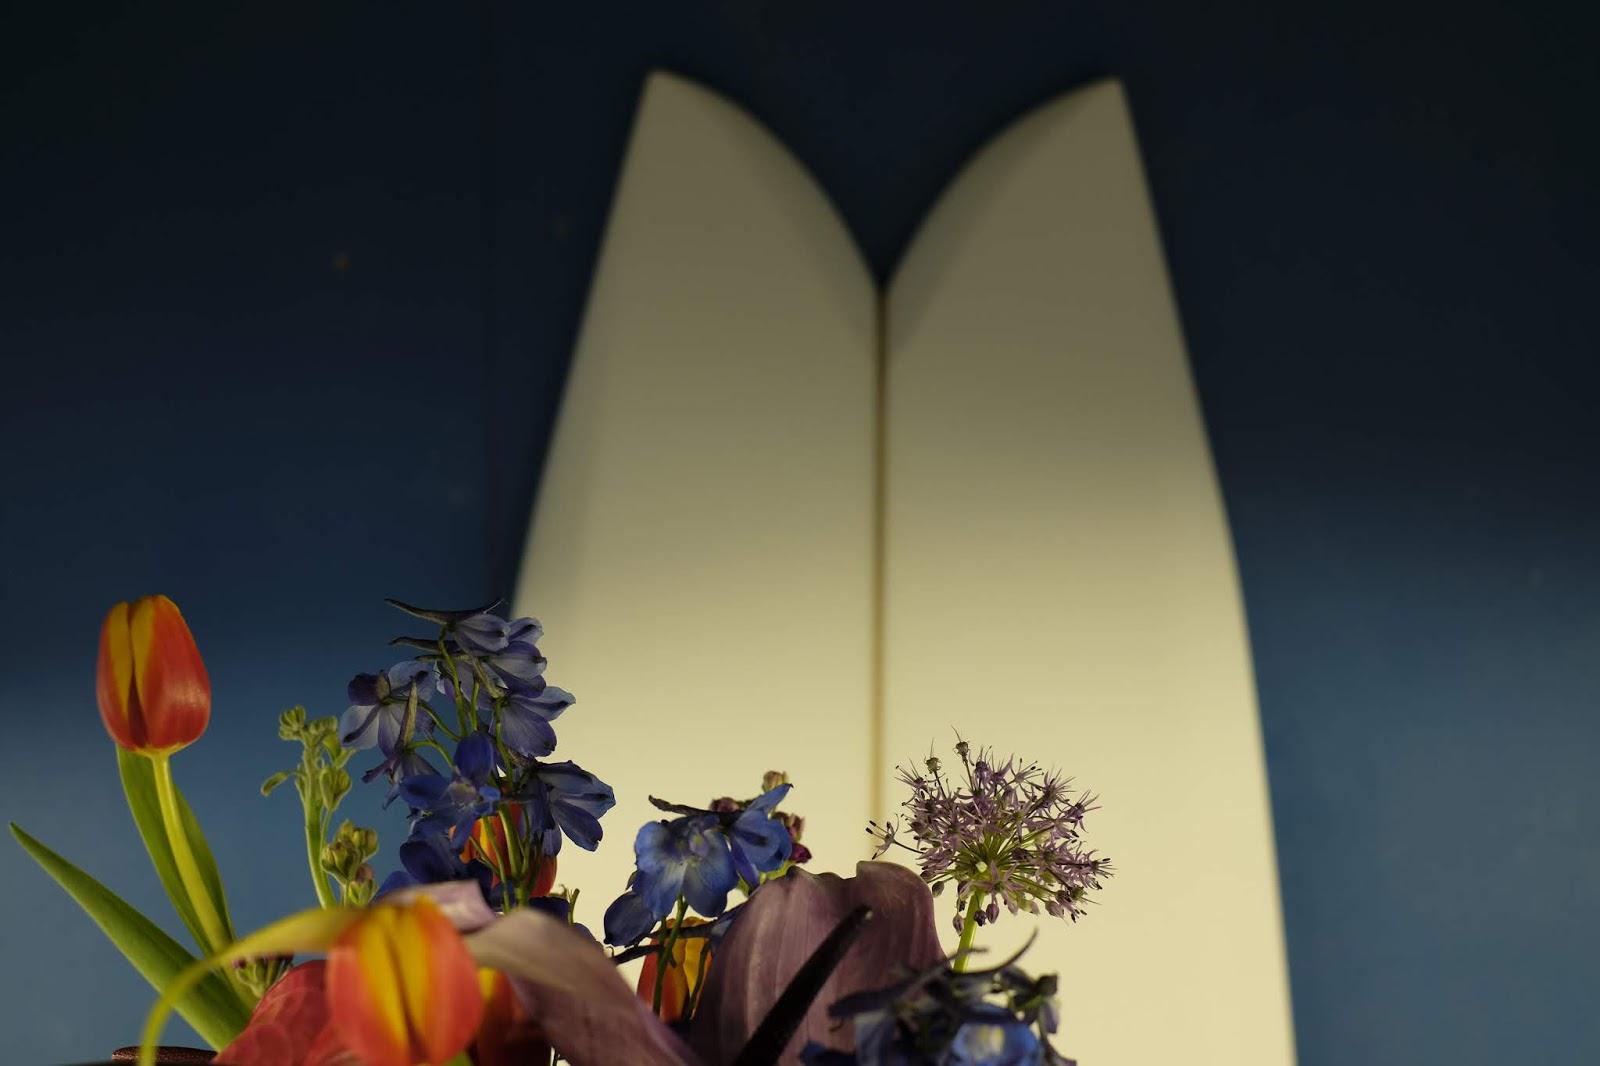 surfinestate surf shop shape shaper handshape Charlotte twinfin fish Hossegor France Arthur Nelli Vincent Lemanceau